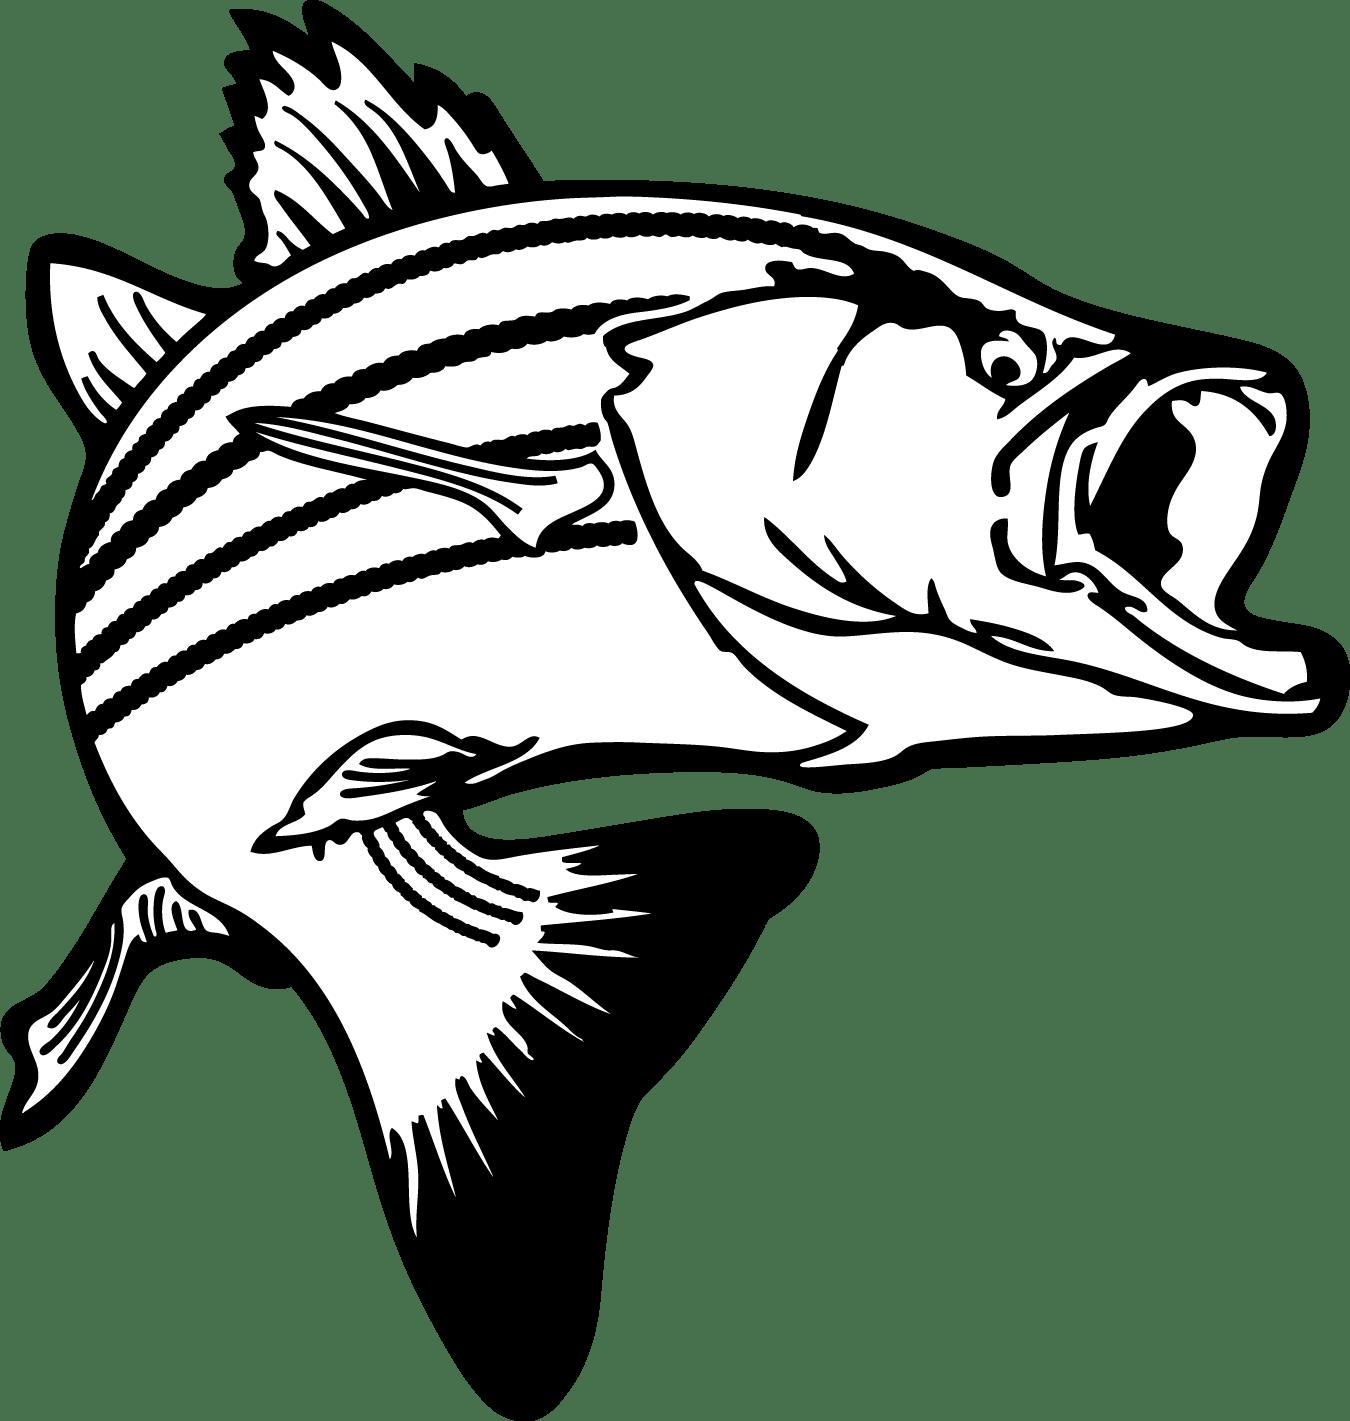 Fish Black And White Drawing At Getdrawings